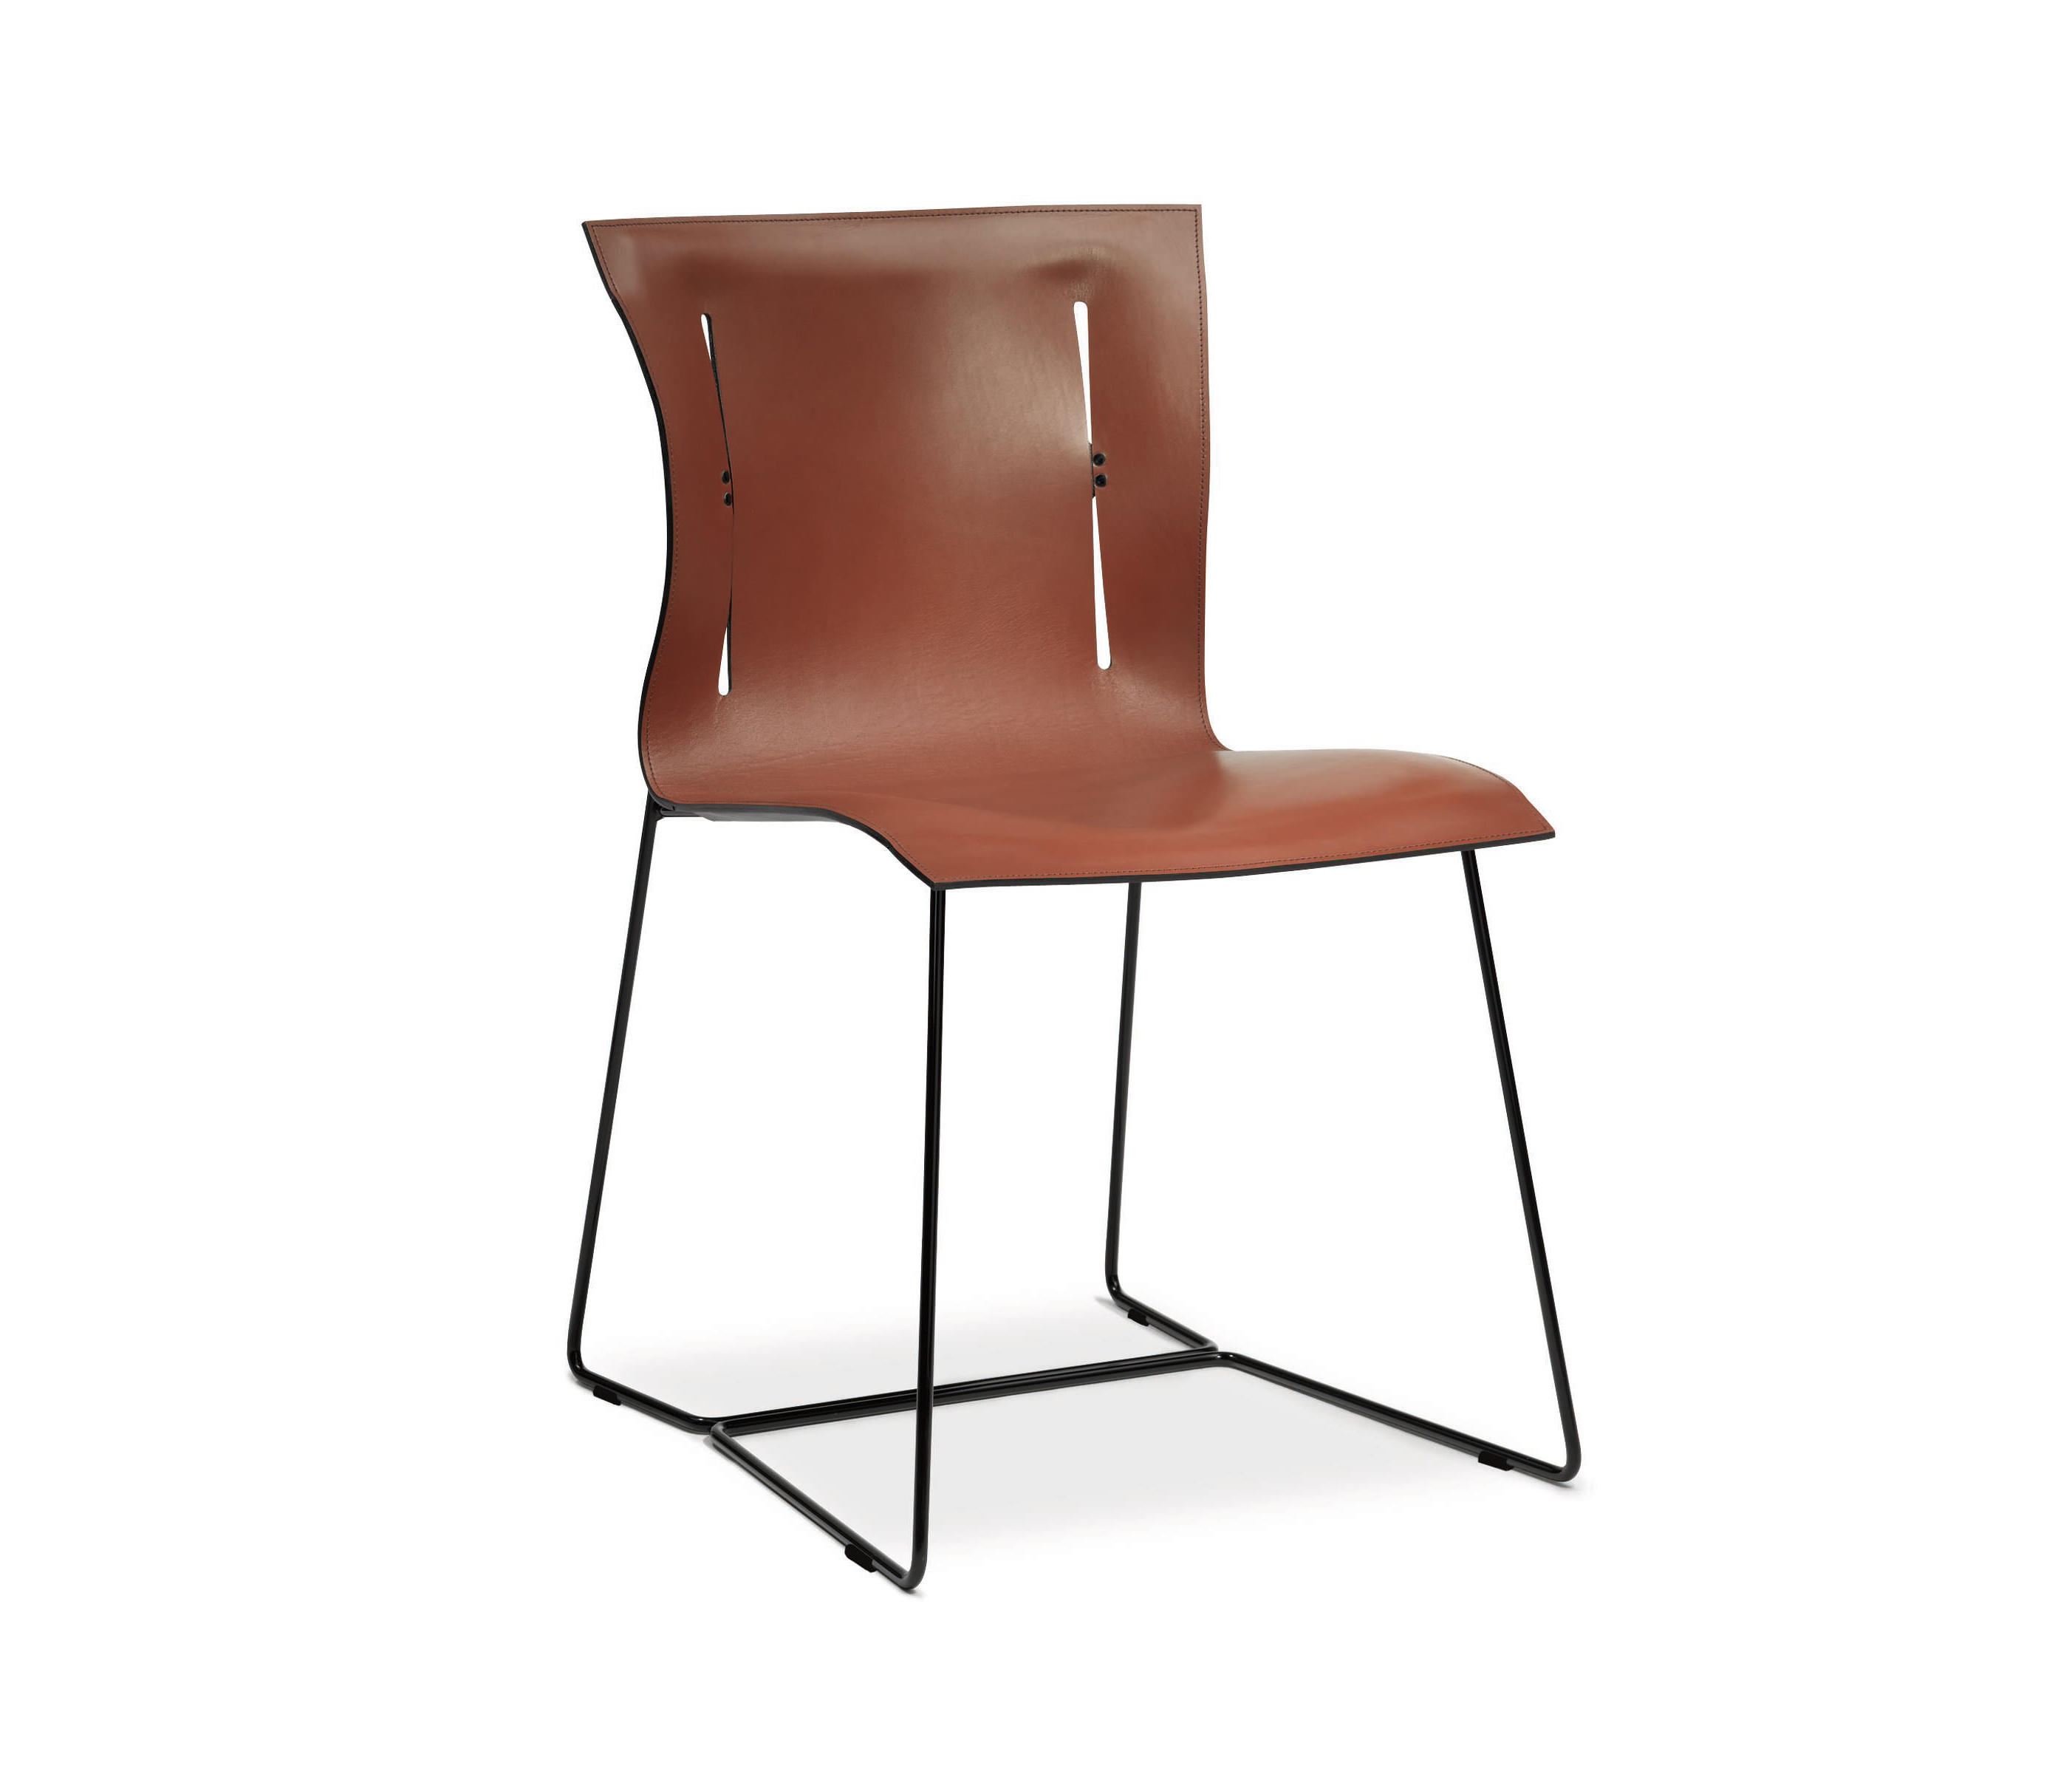 Cuoio Stuhl Stuhle Von Walter Knoll Architonic